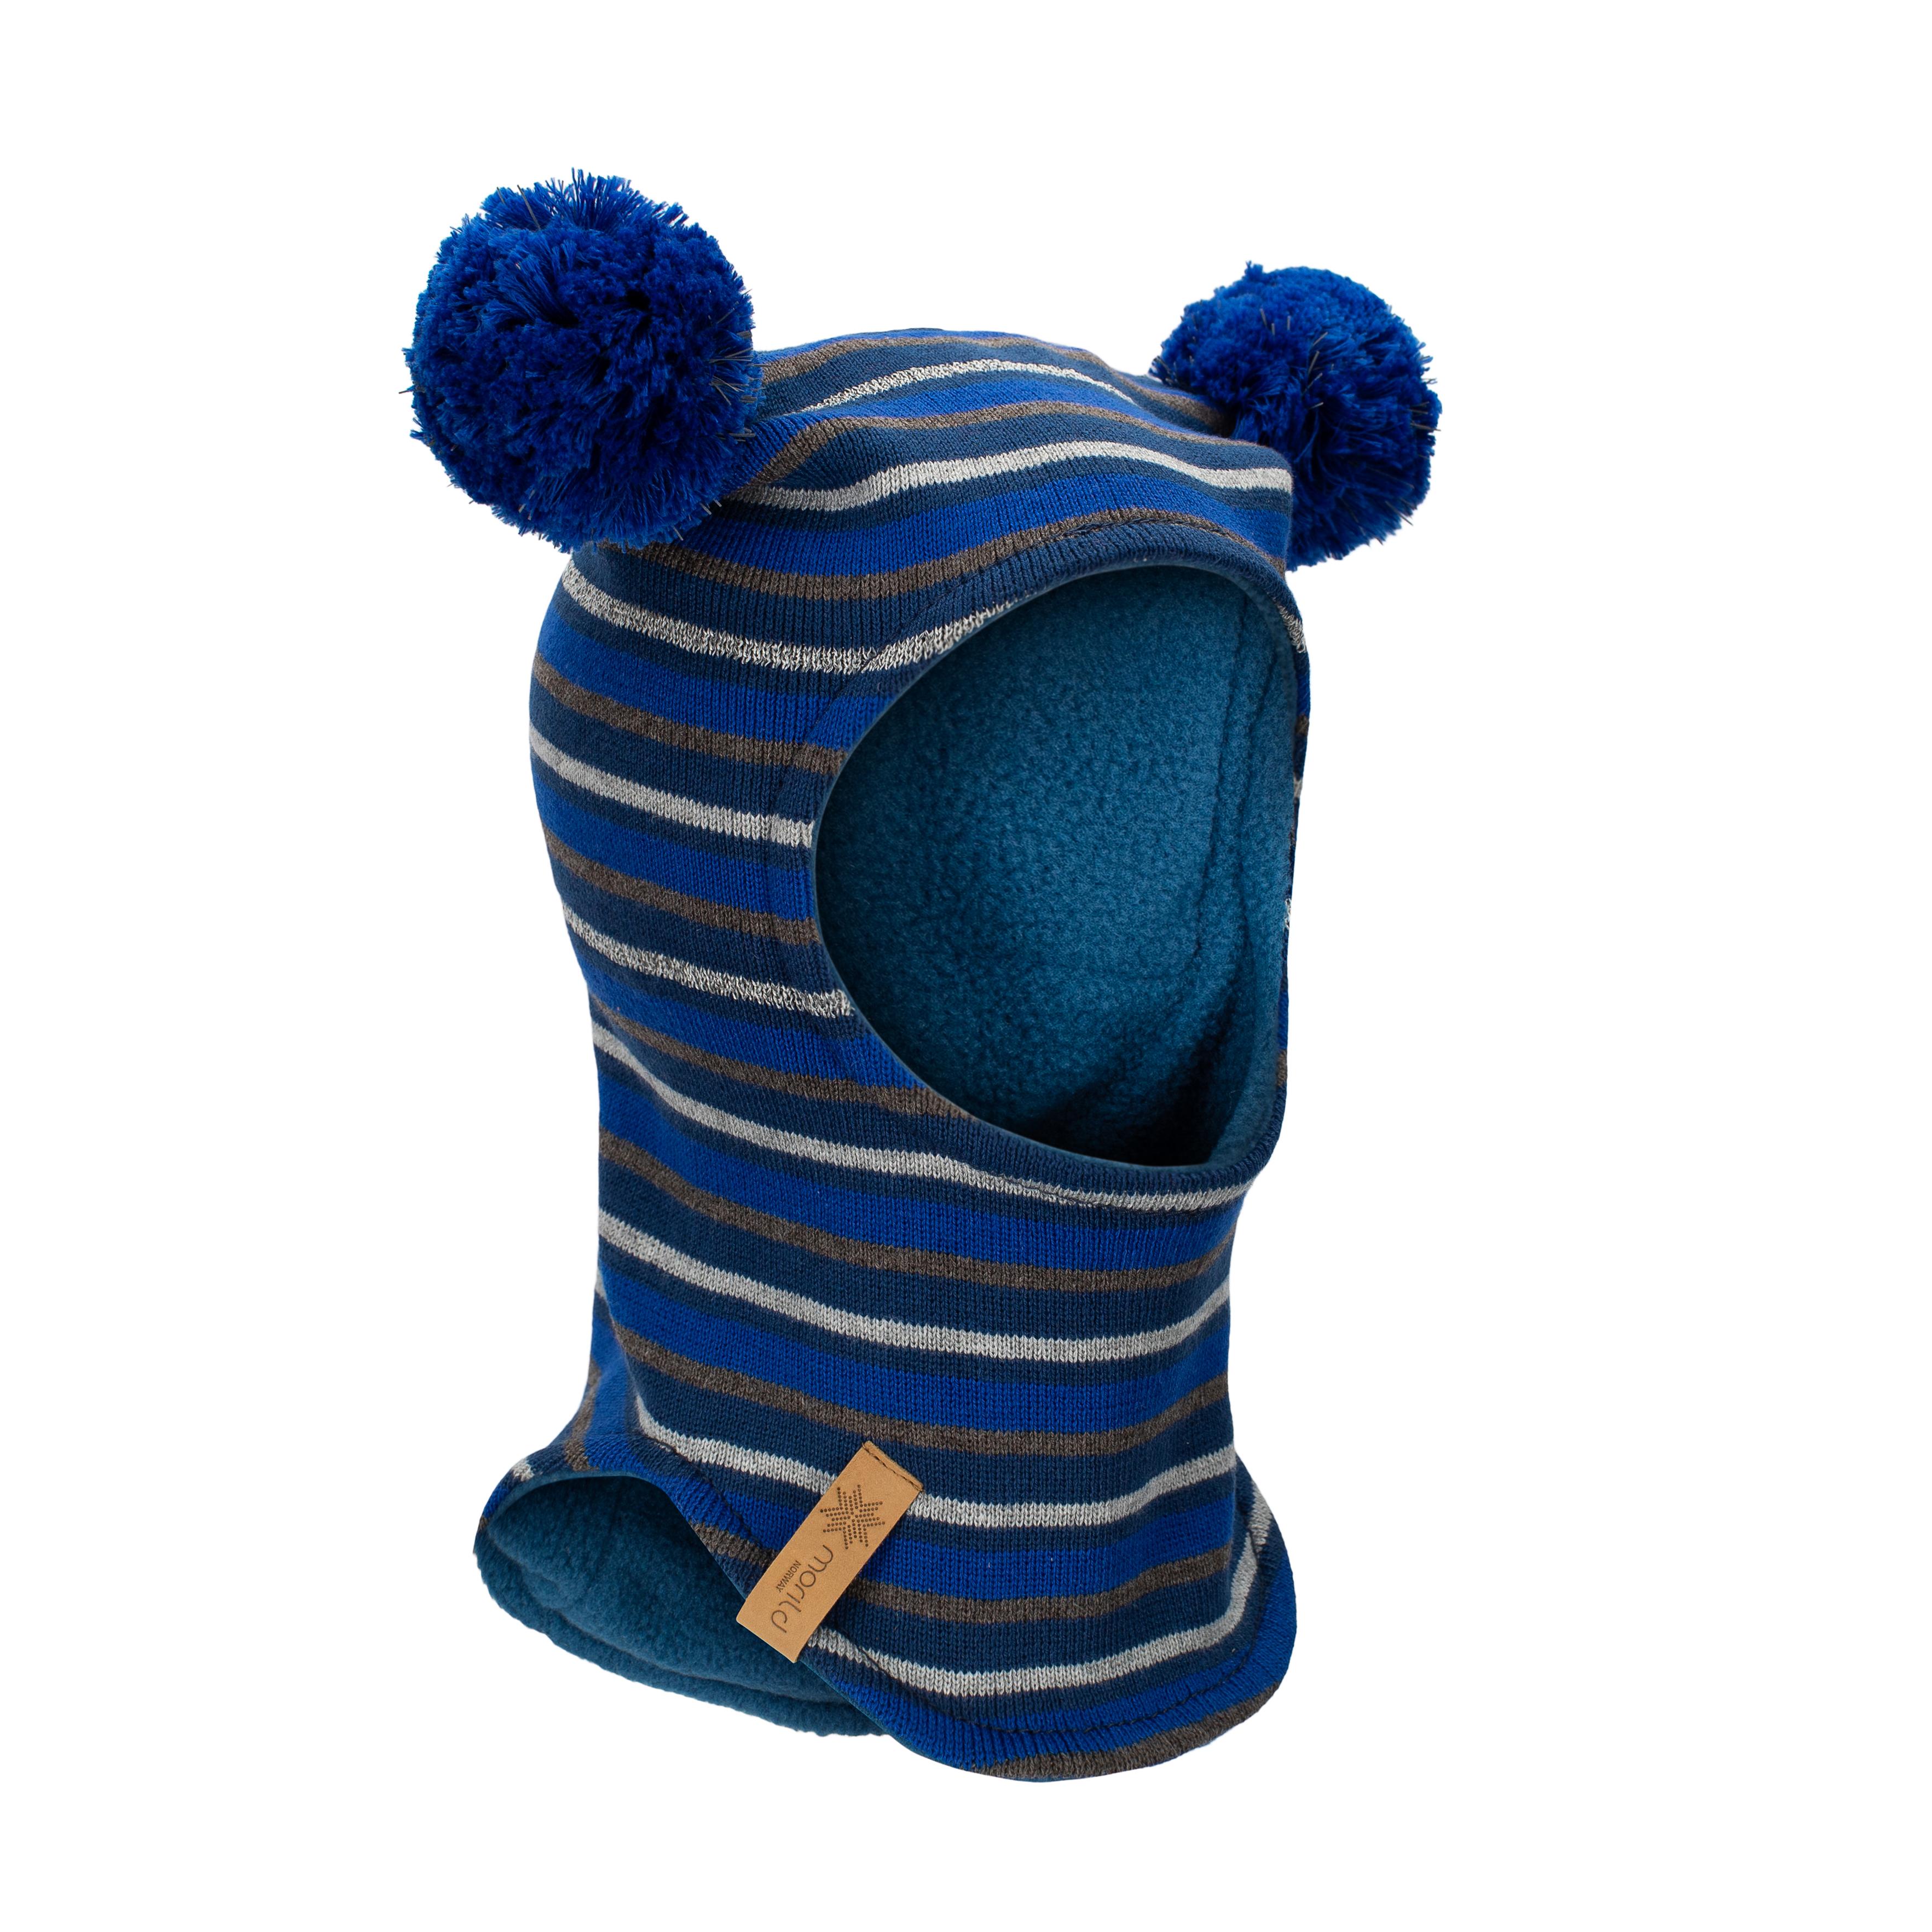 Morild Fonn balaklava med refleks, klar blå